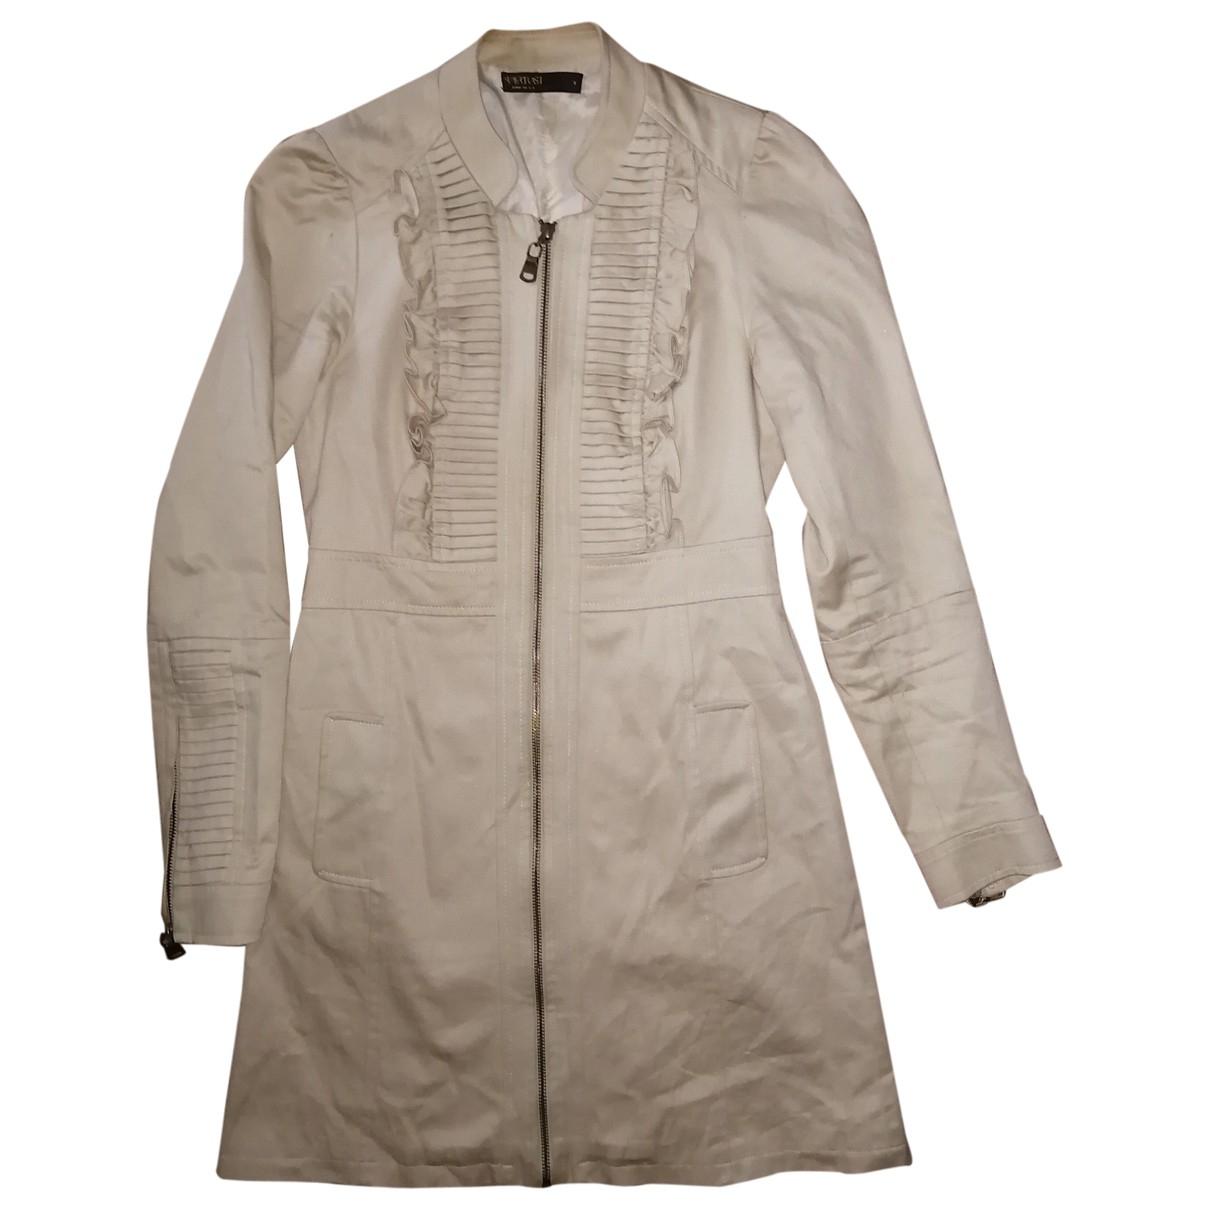 Supertrash \N Beige Cotton jacket for Women S International